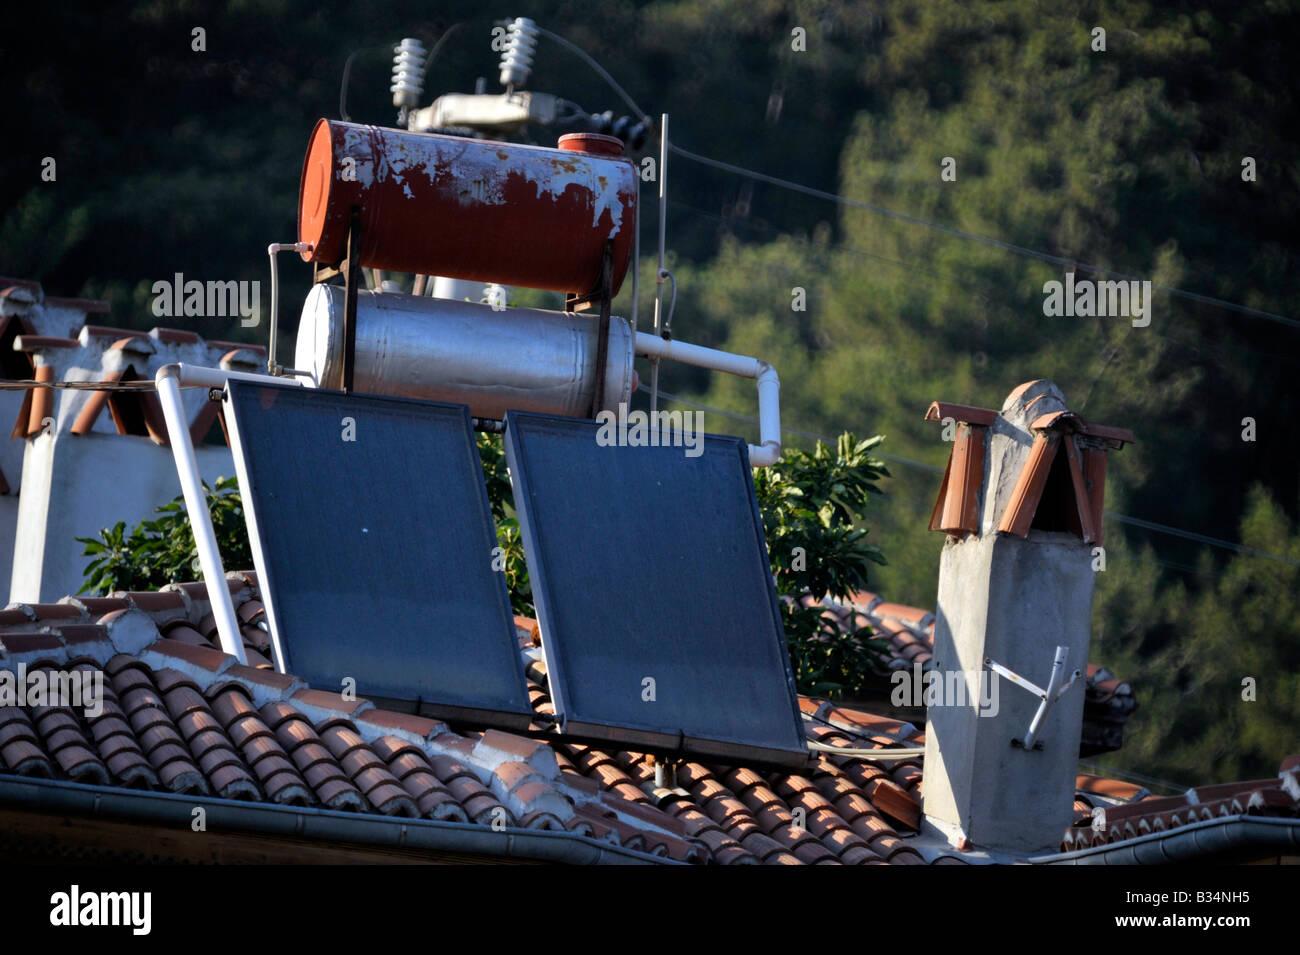 solar heating panels and water storage tank on Turkish house roof Akyaka Turkey - Stock Image